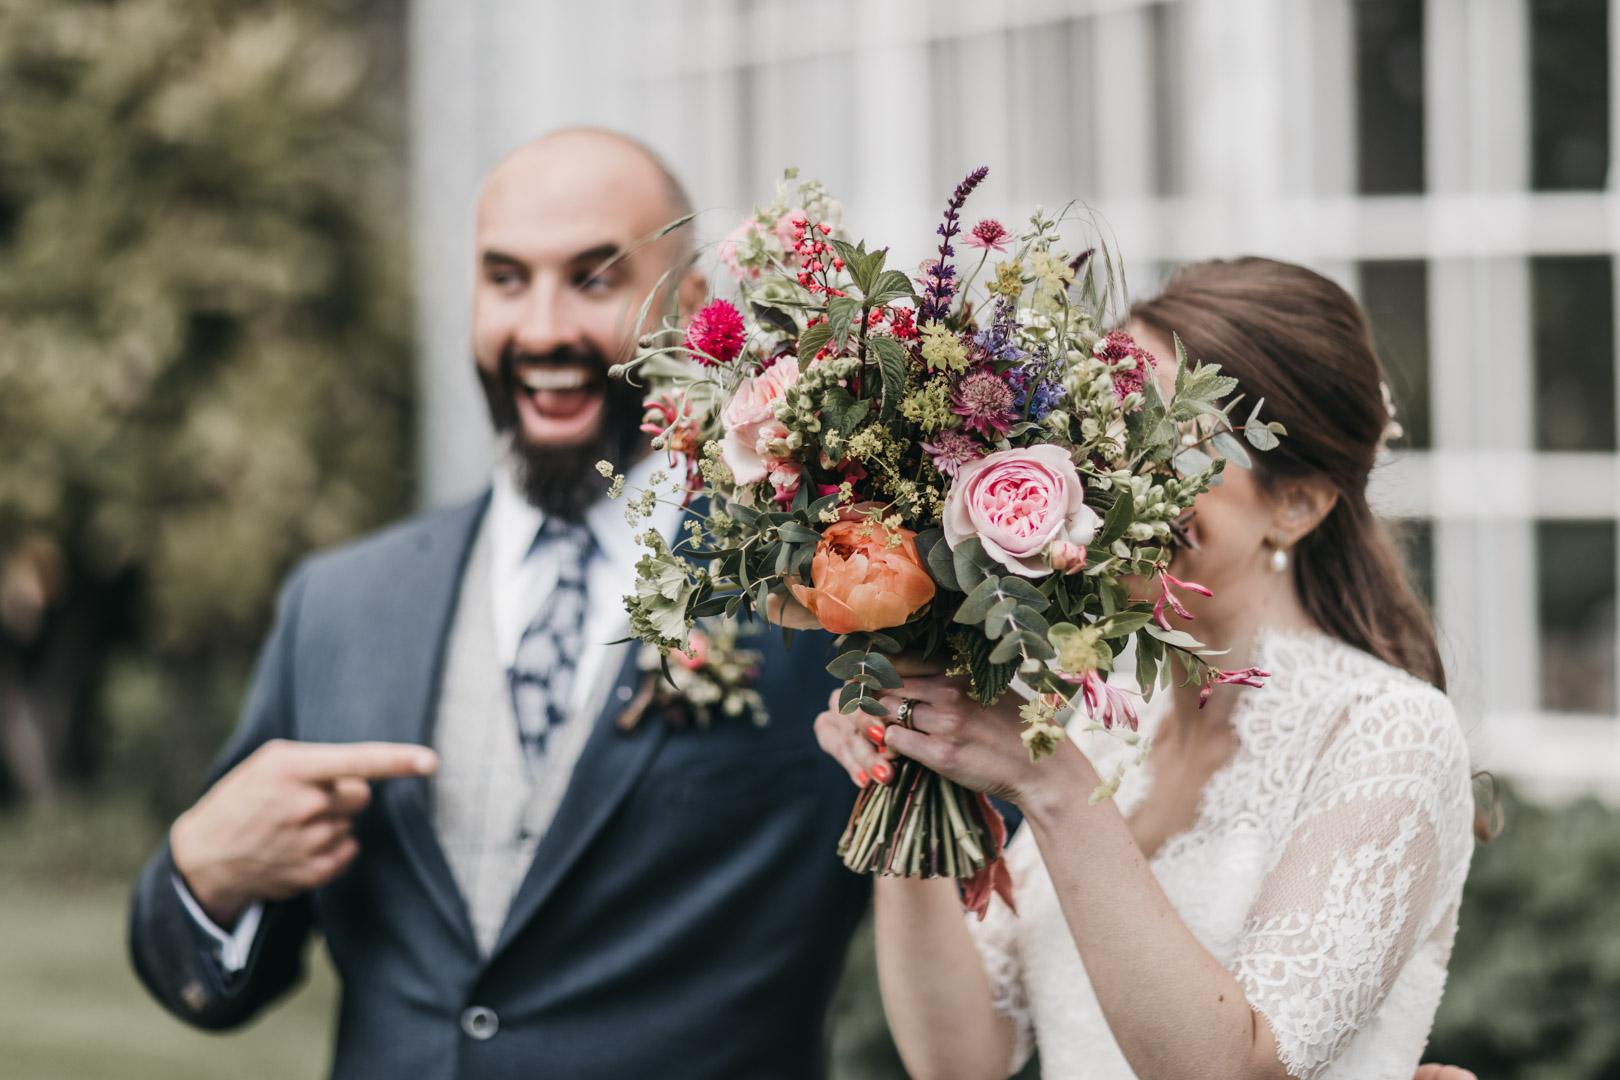 benwigglesworth.com - Wedding Photography Cornwall-12.jpg